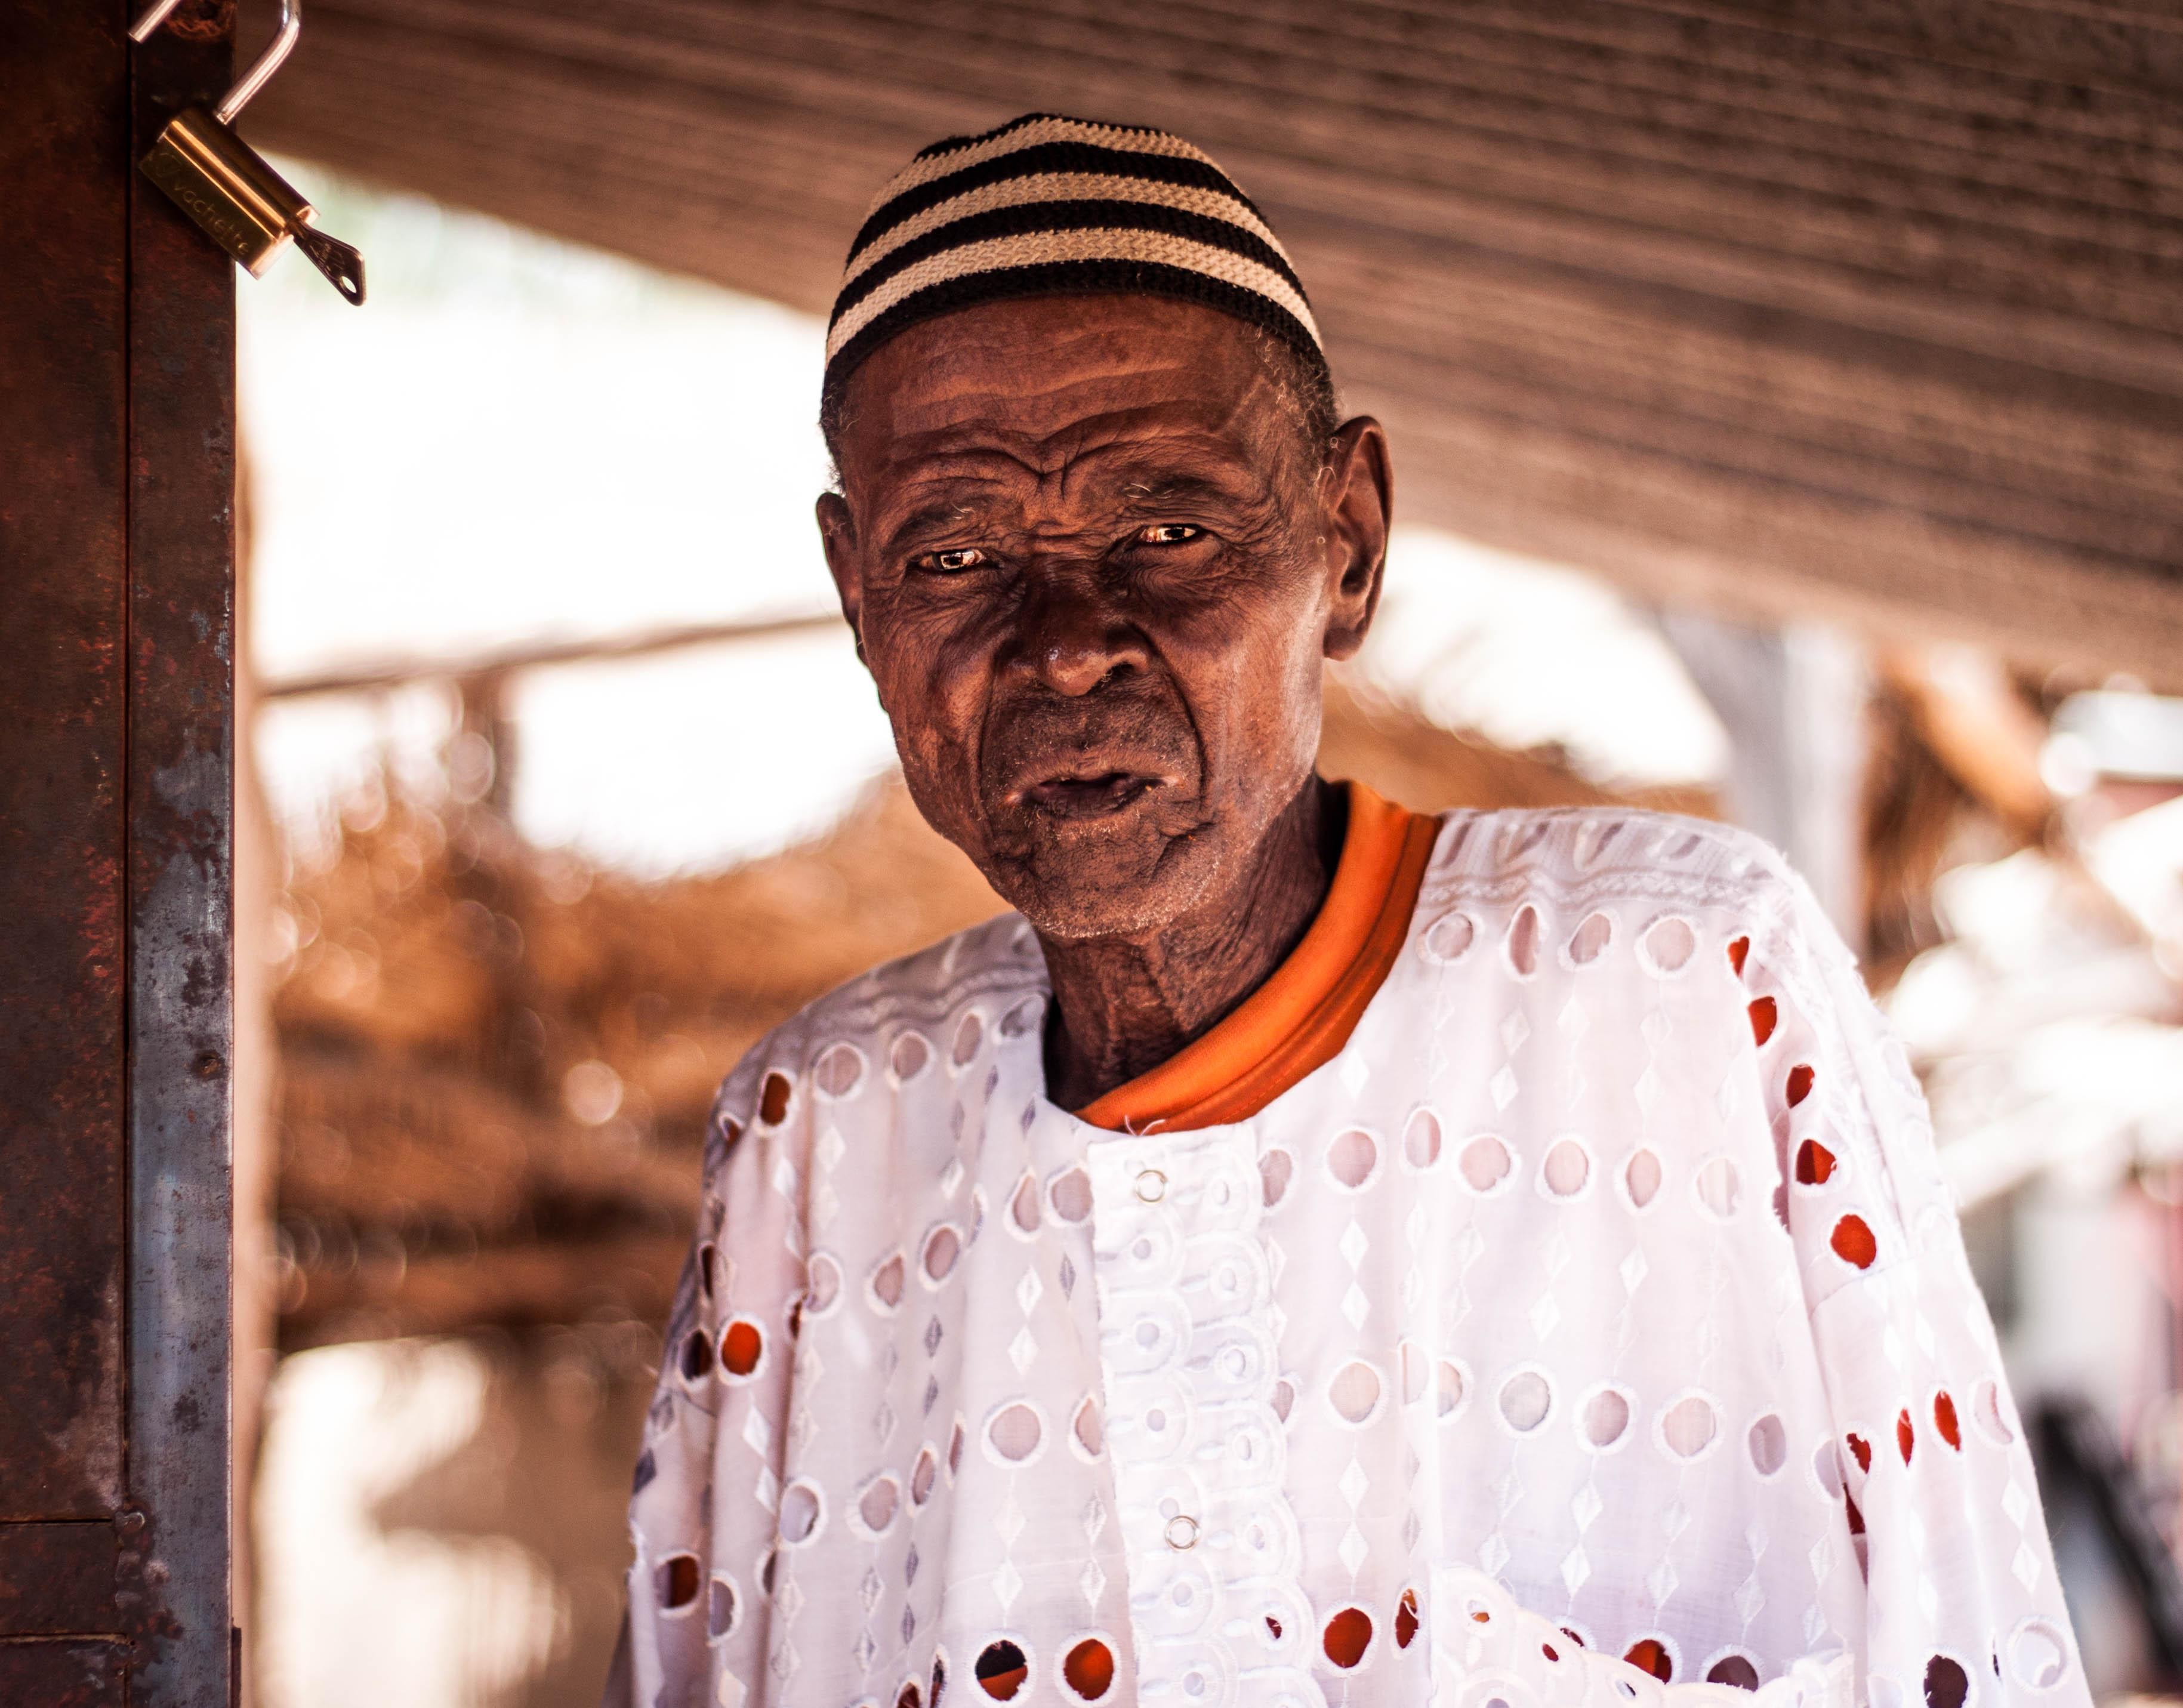 BURKINA FASO 2017